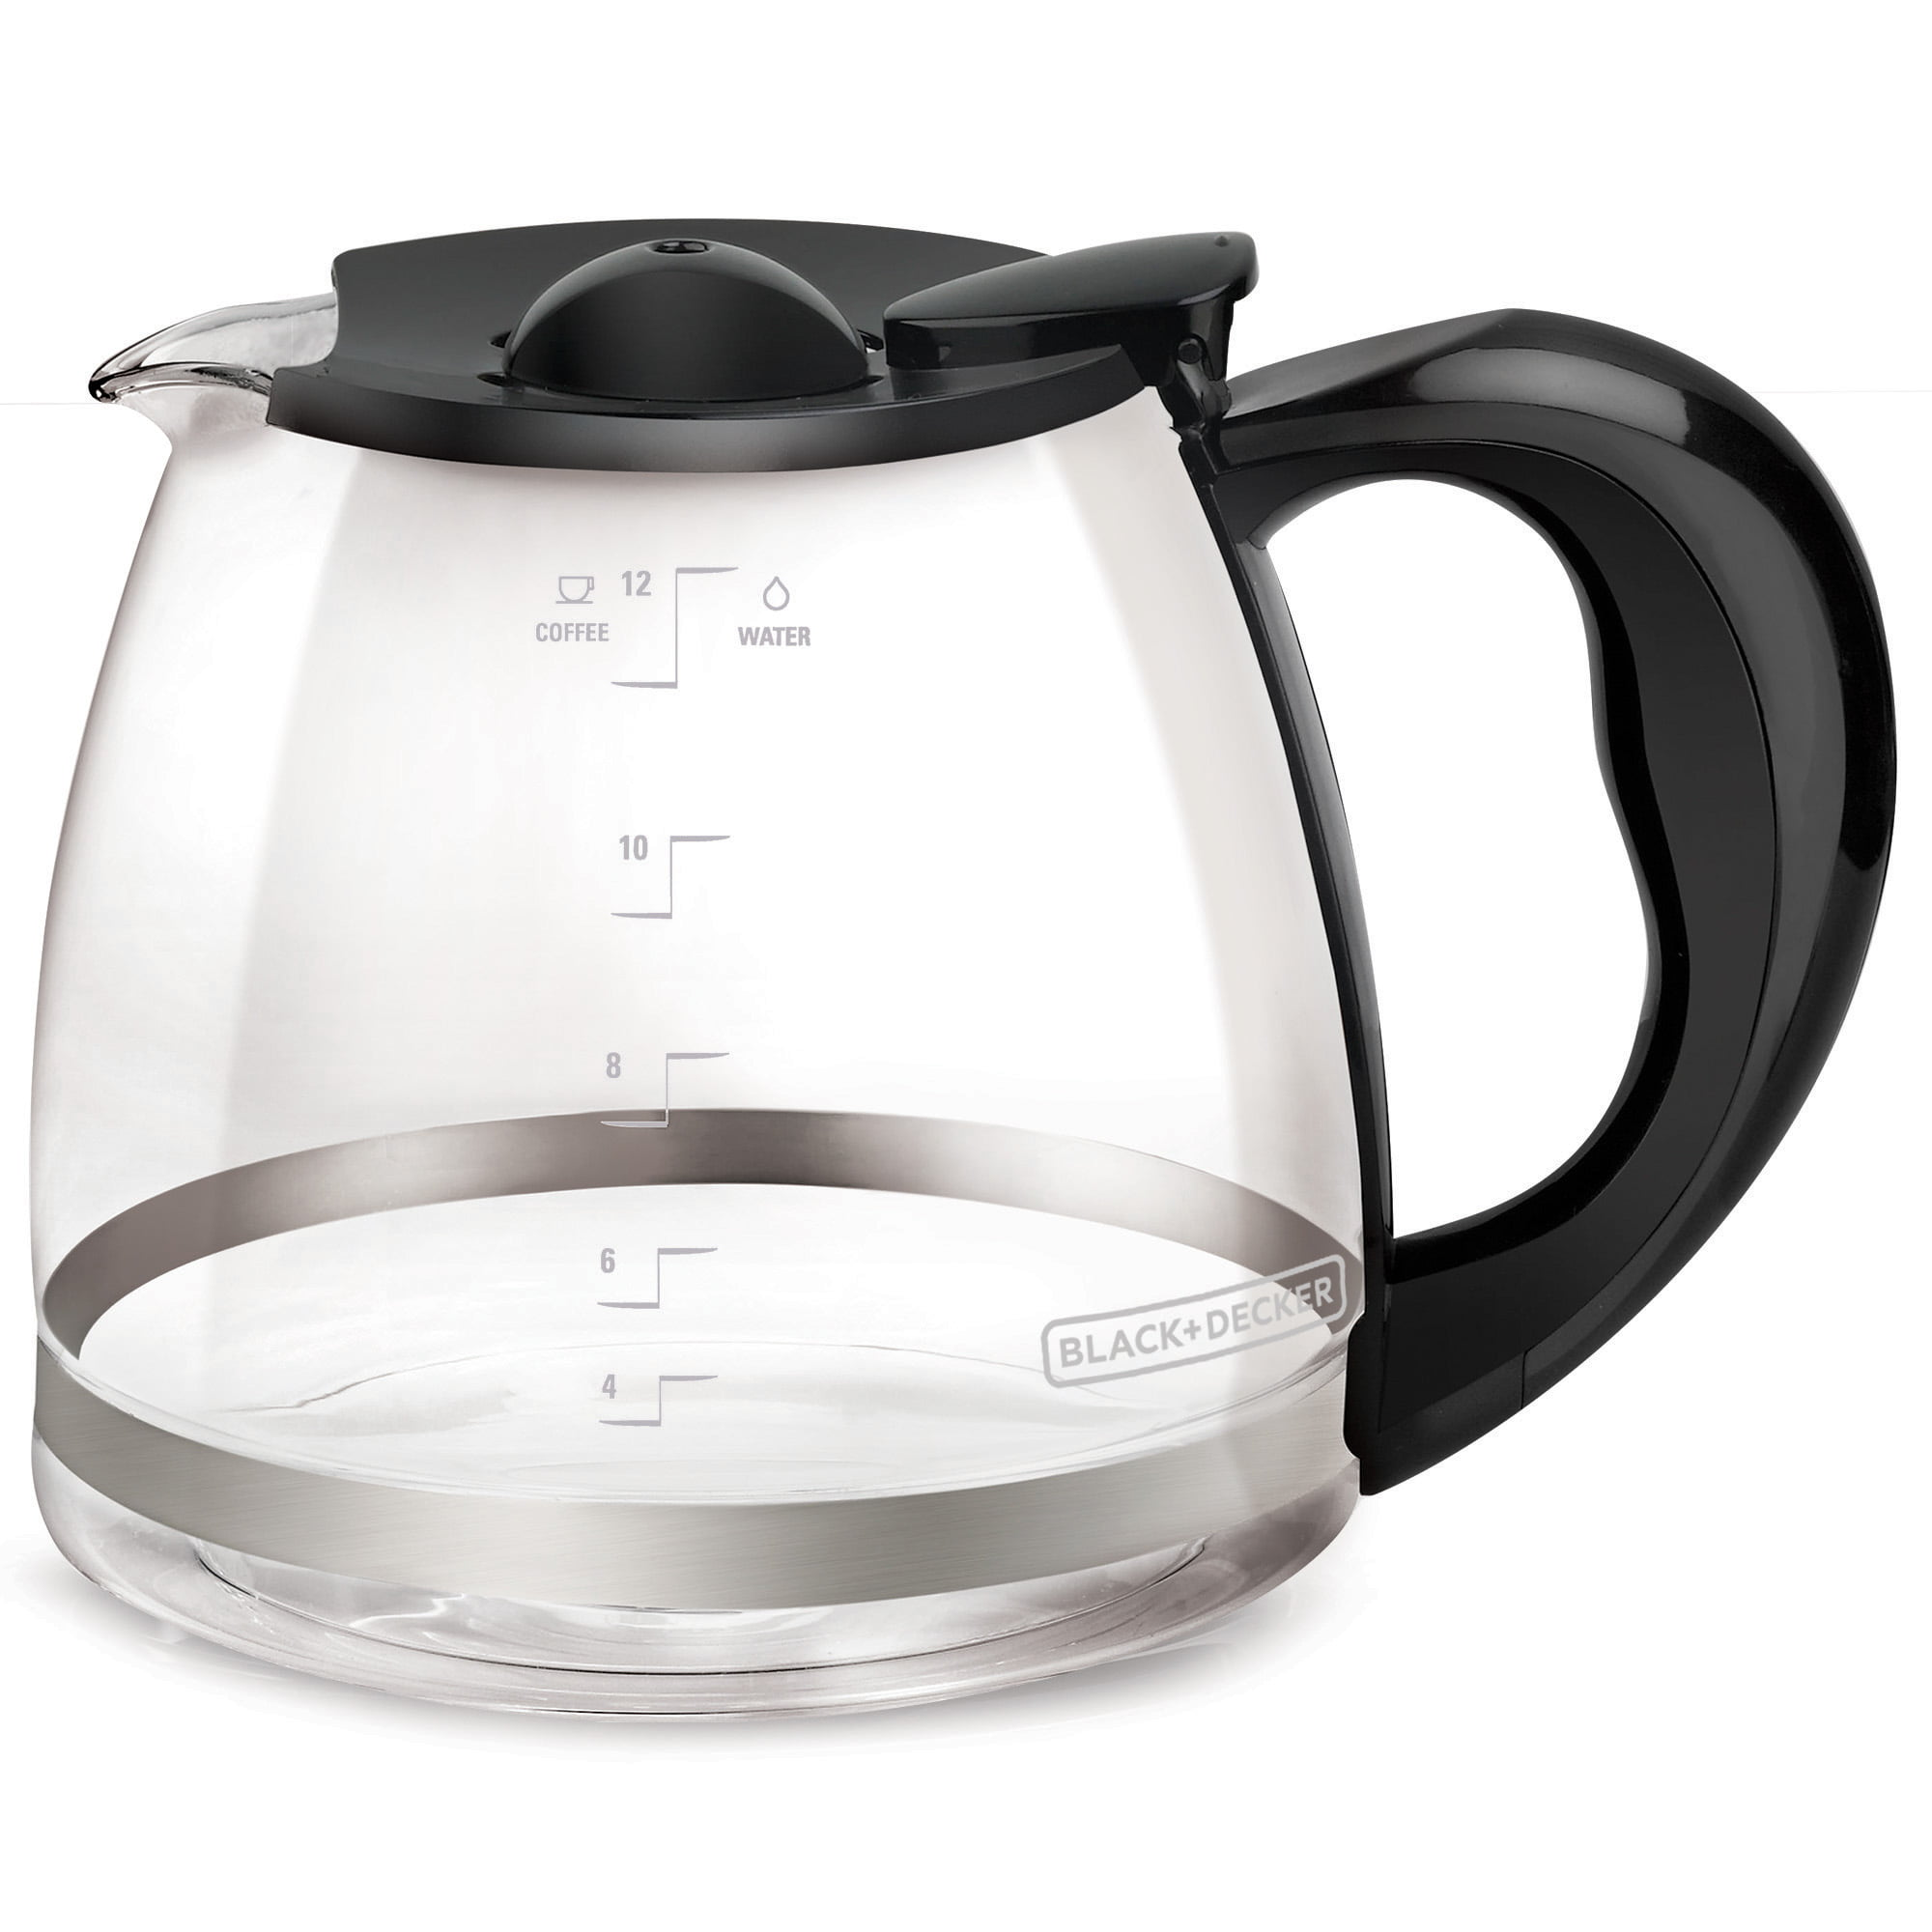 Black & Decker 12-Cup* Replacement Carafe, Glass, GC3000B-T by BLACK DECKER